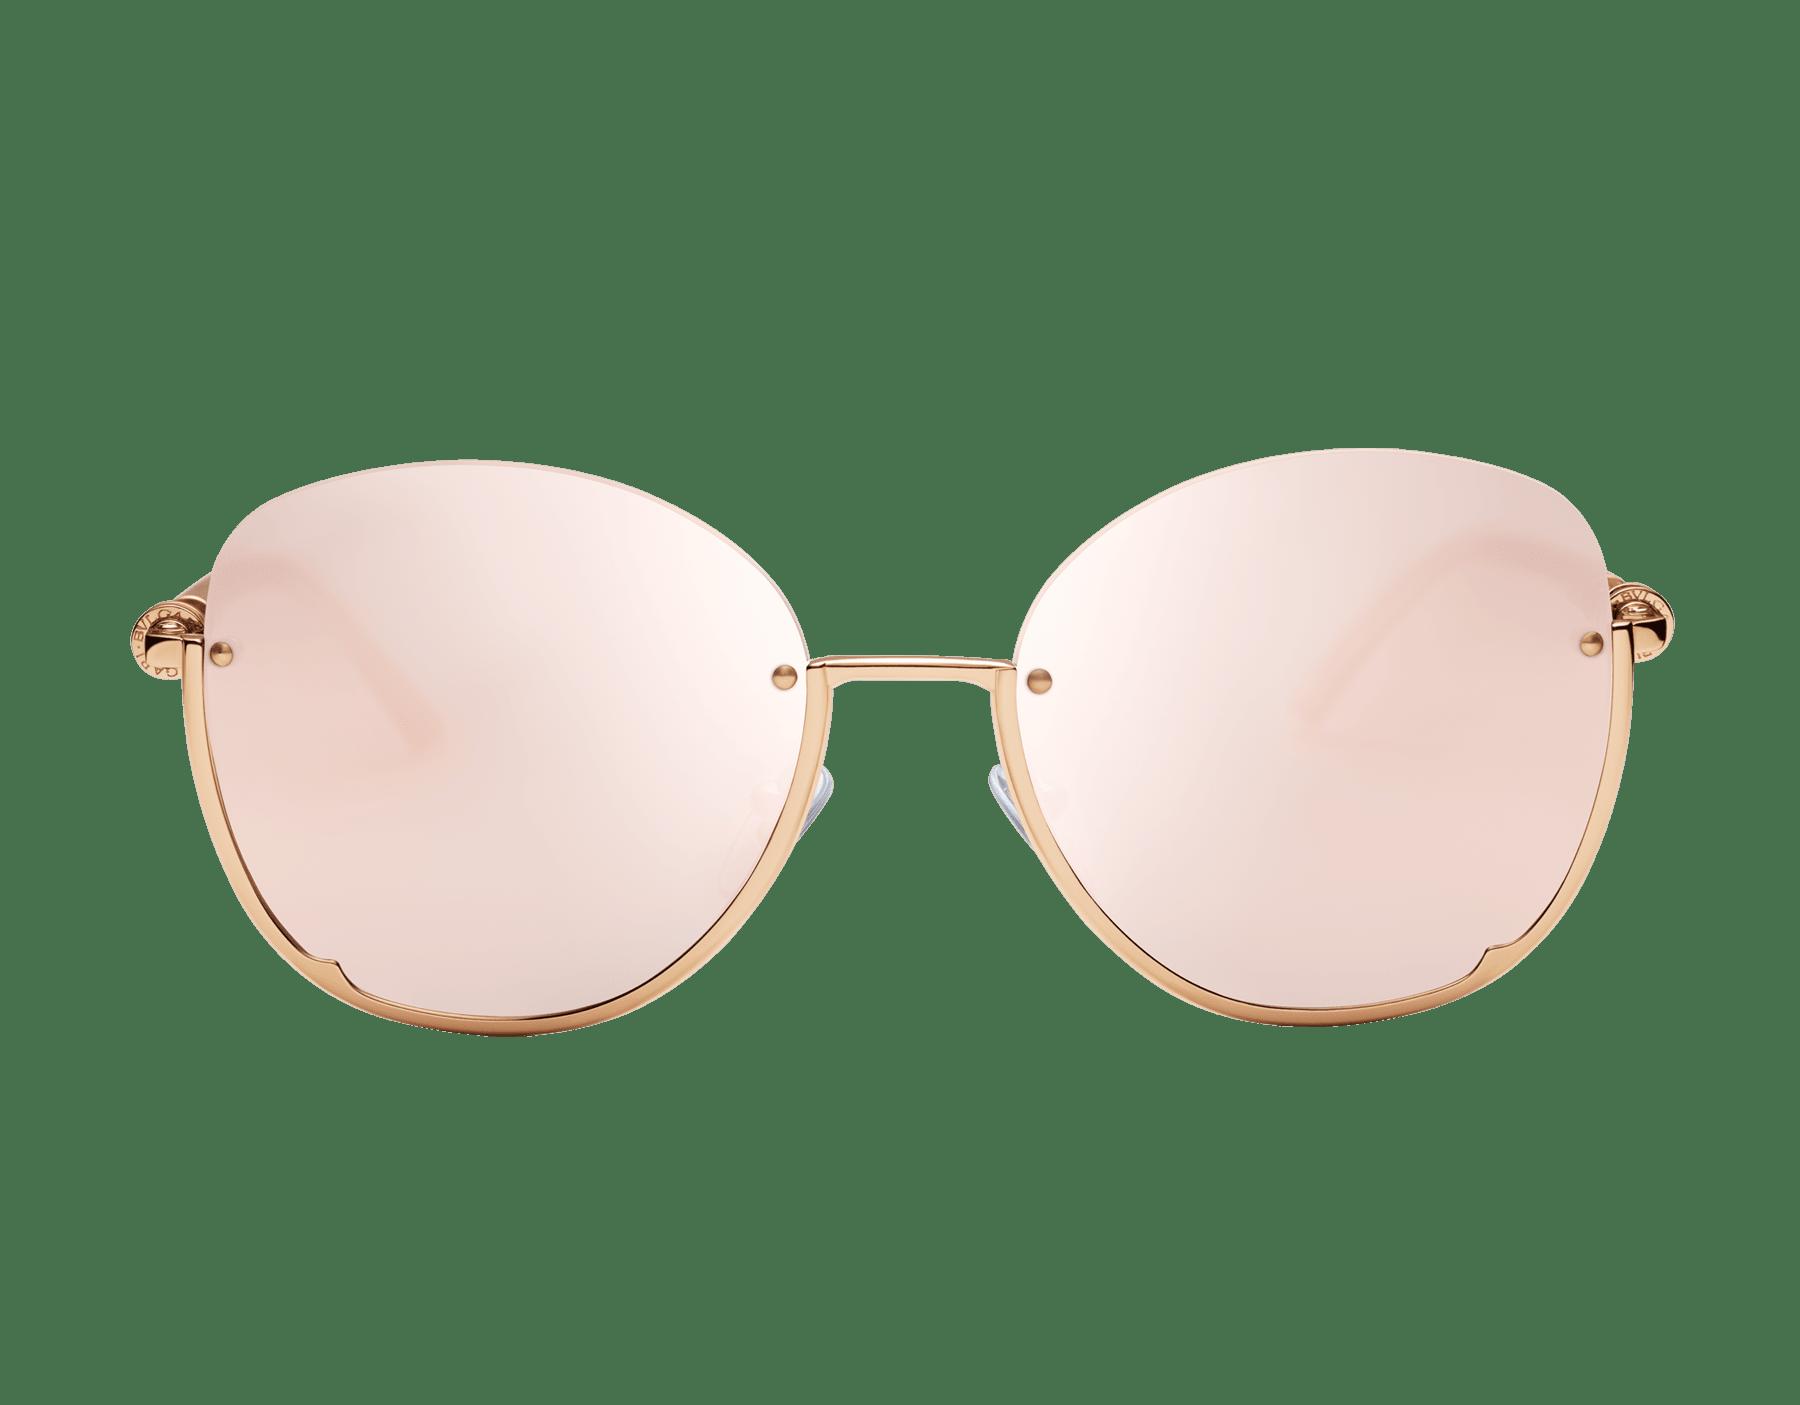 Runde Bvlgari B.zero1 Halbrand-Sonnenbrille aus Metall. 903821 image 2